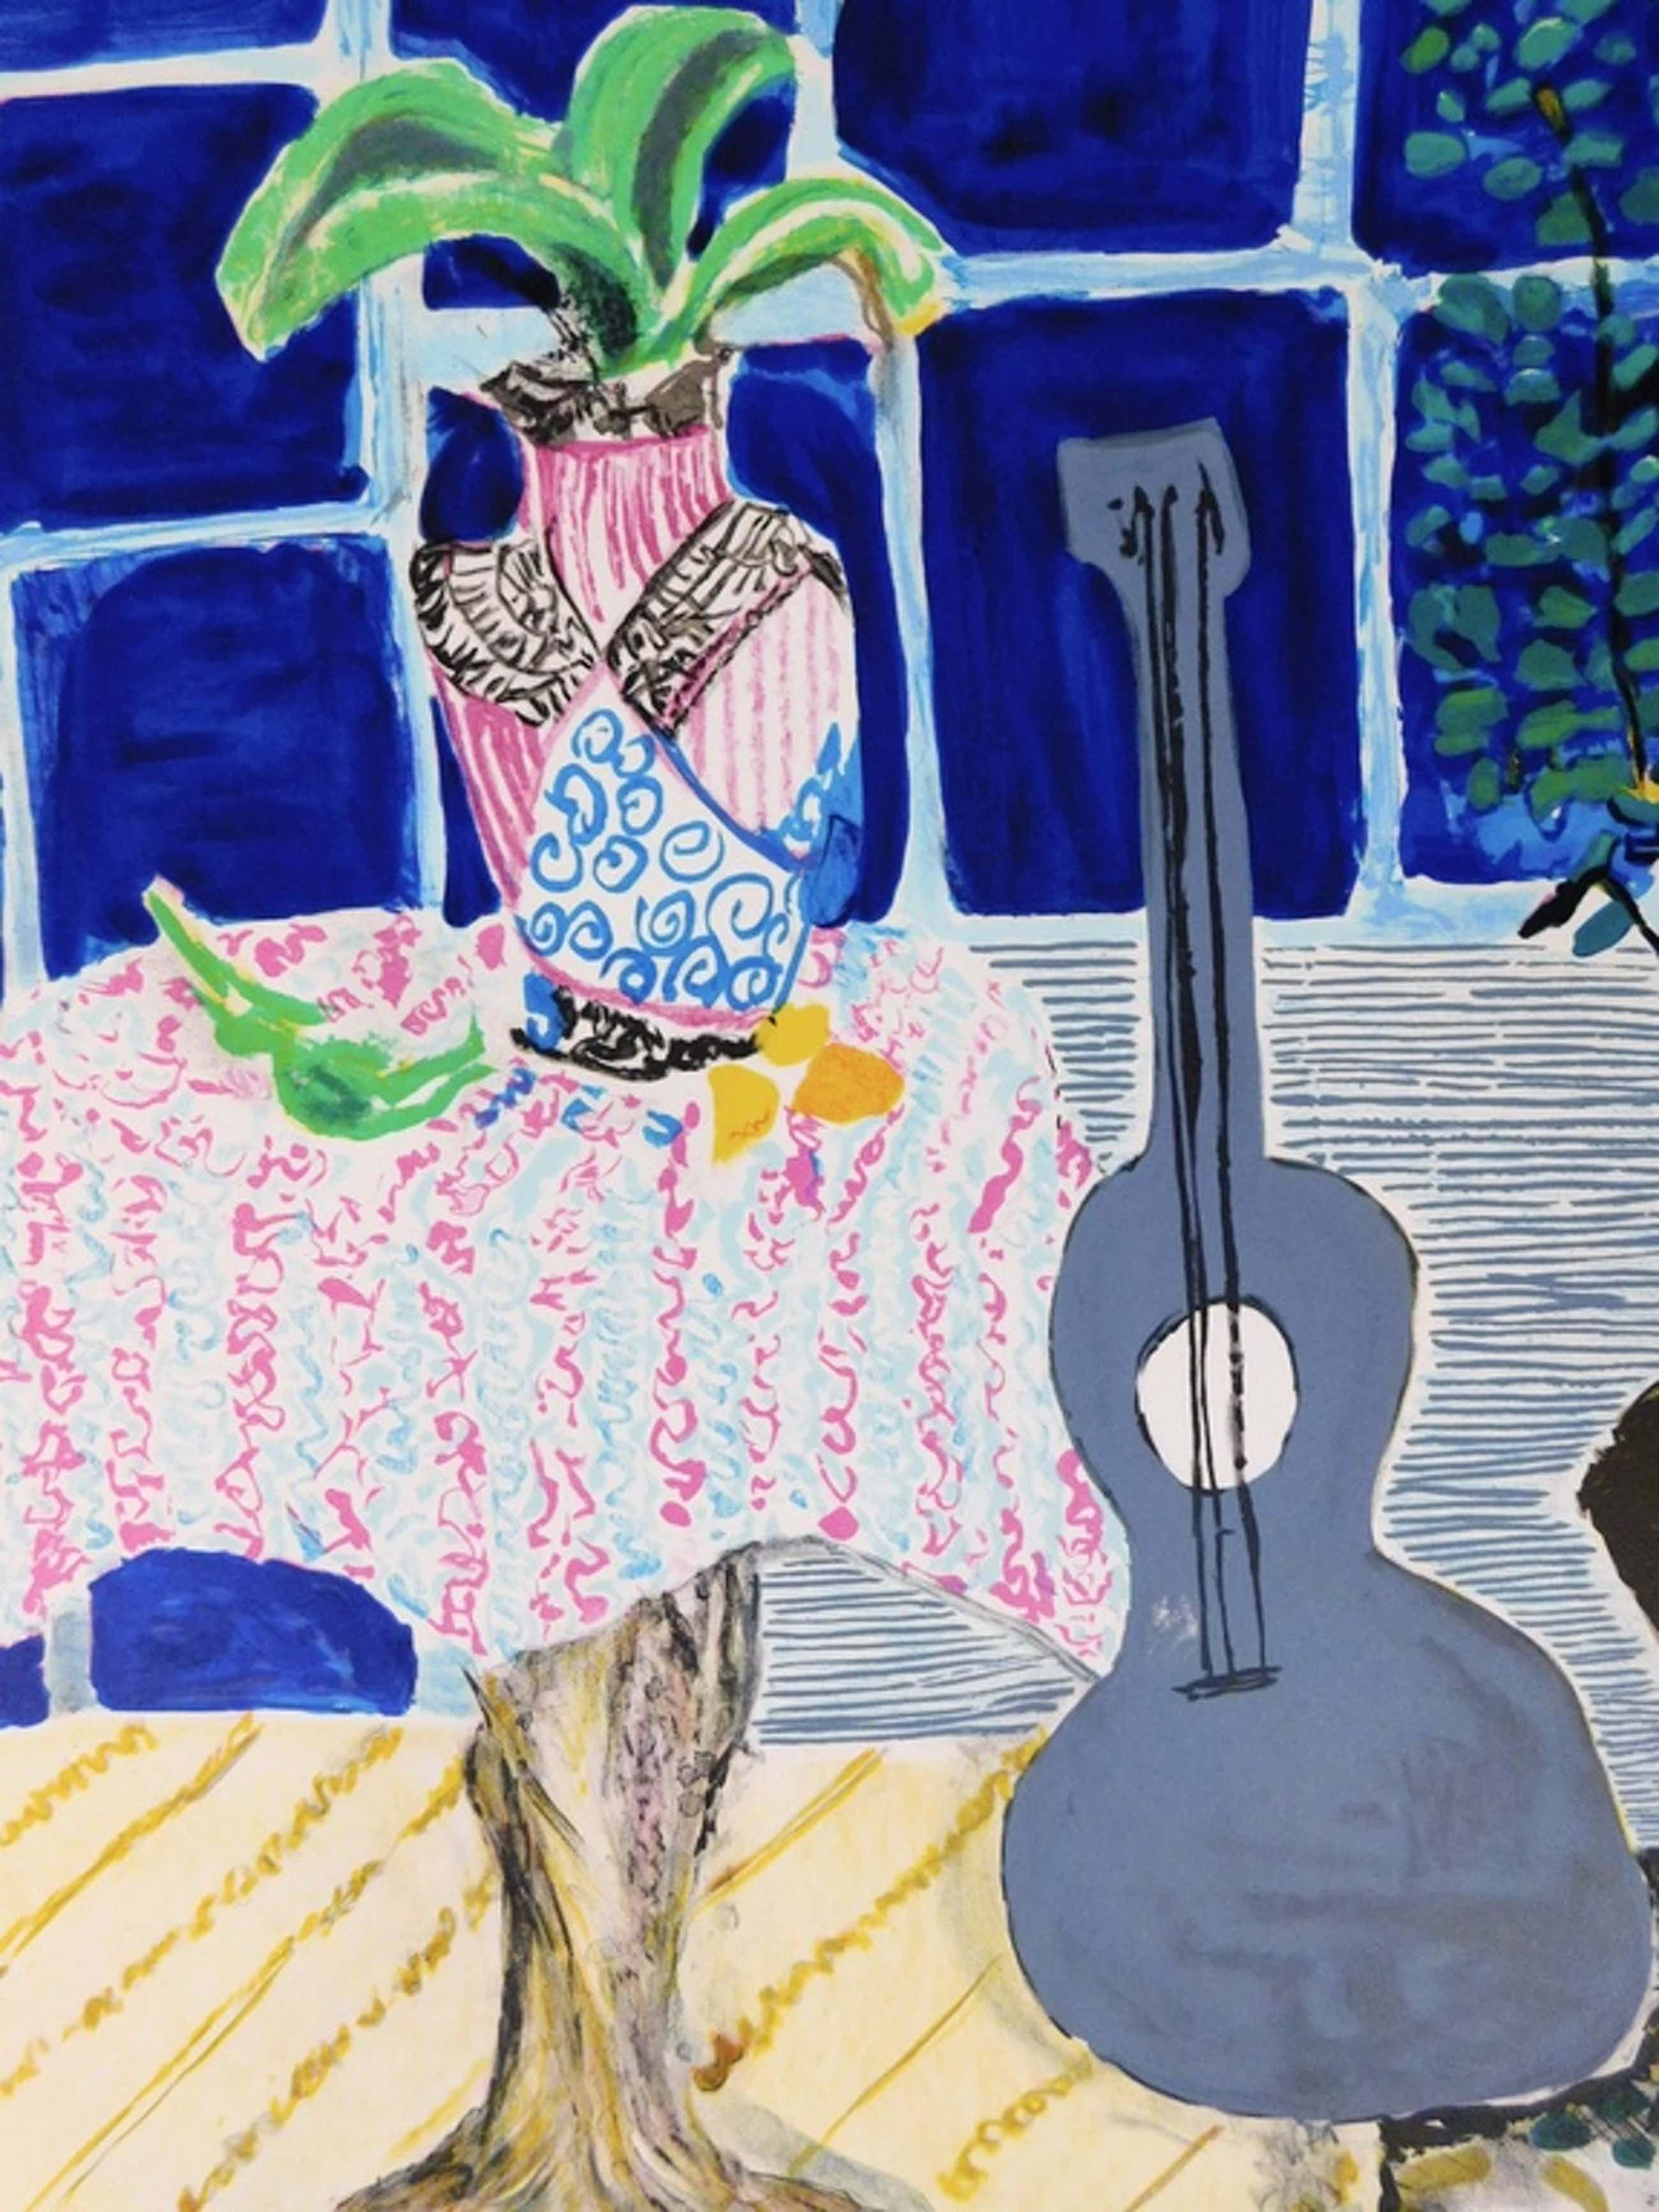 Wendy Chazin - Kleurenlitho - Composition with Guitar and Vase kopen? Bied vanaf 75!